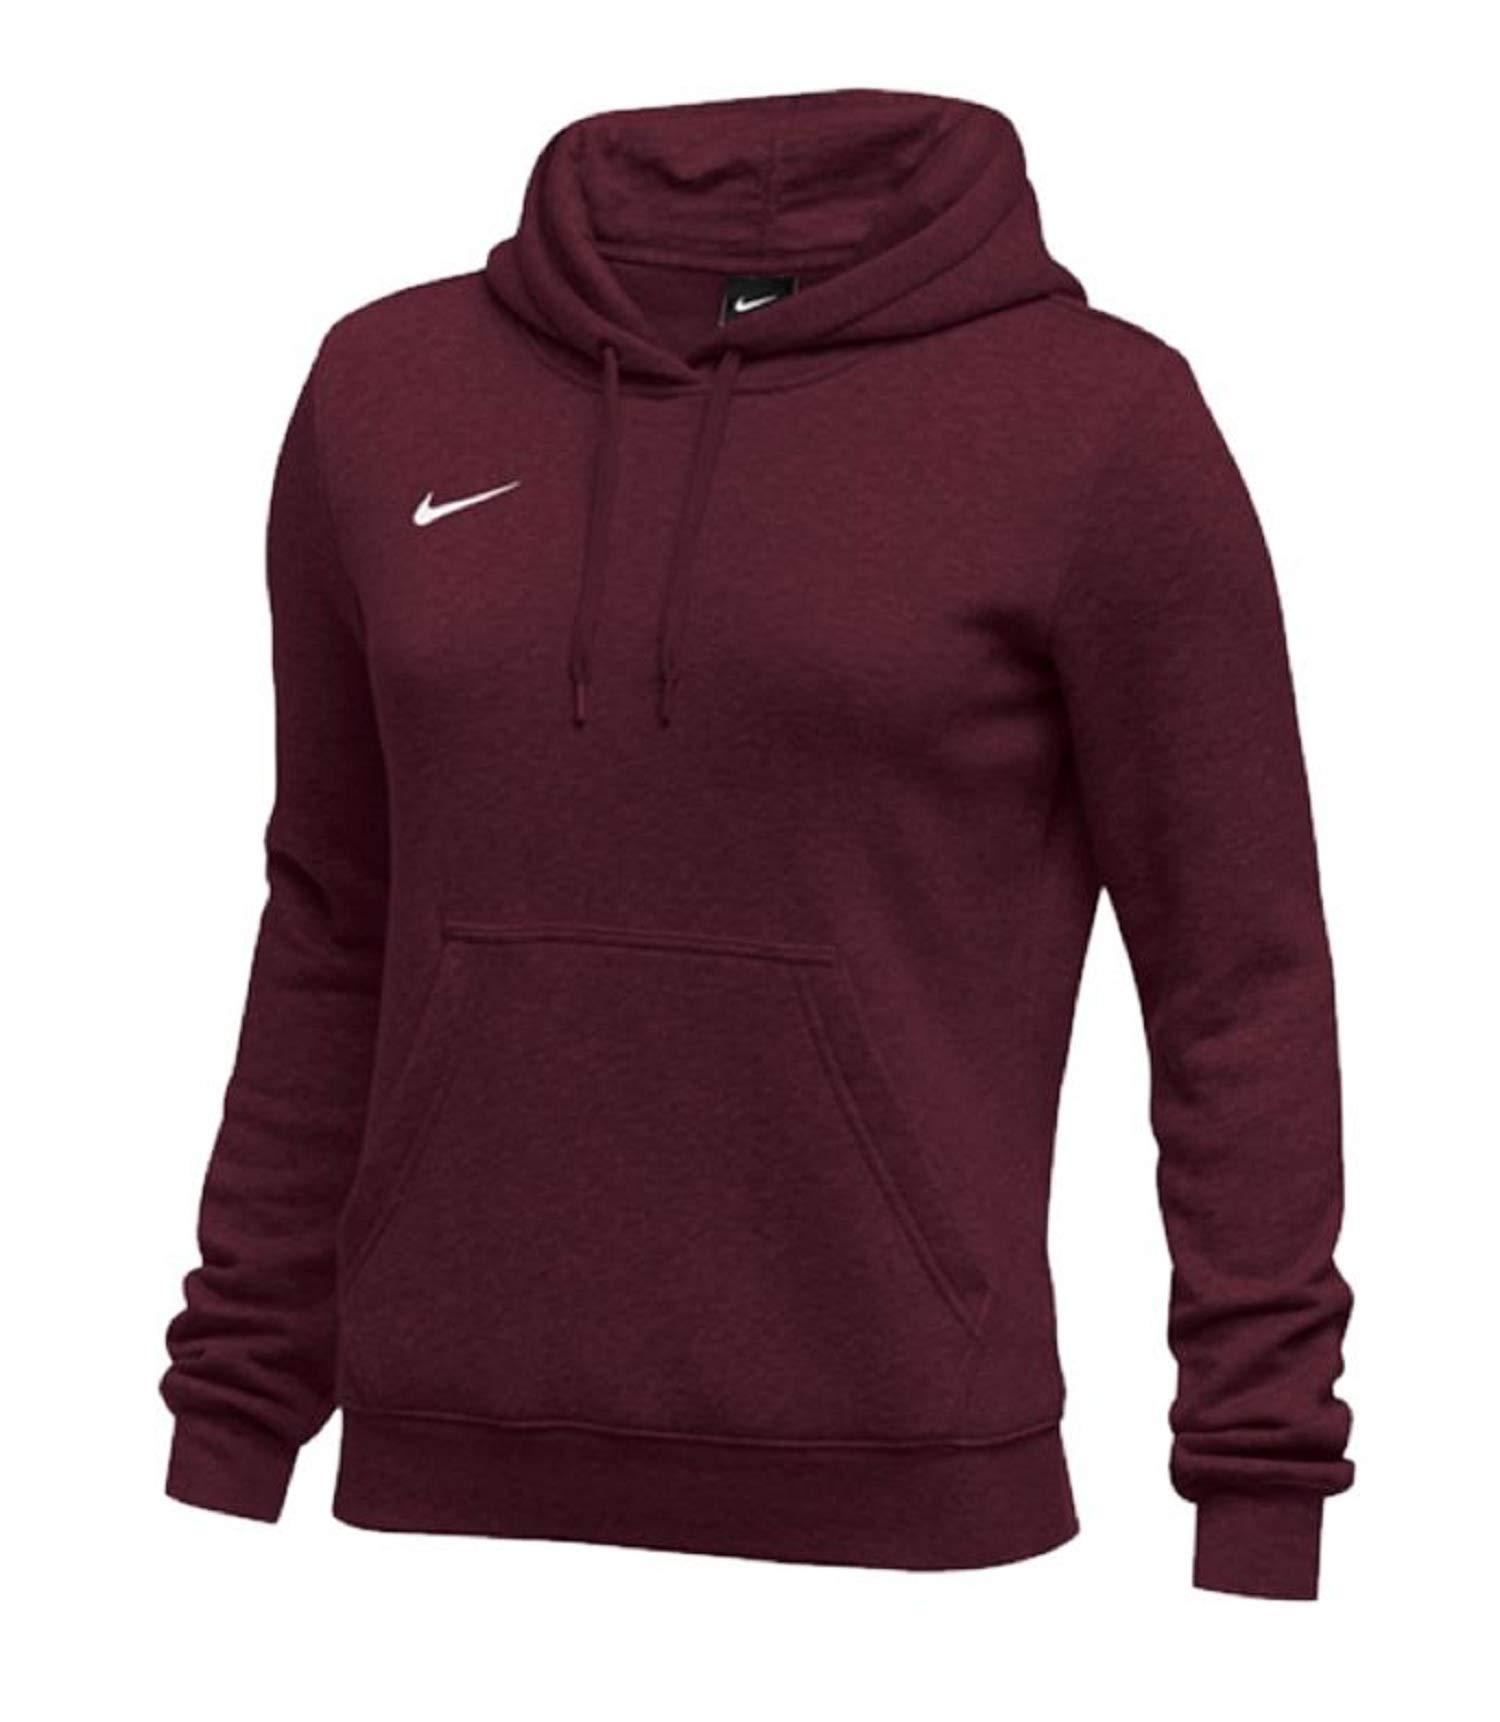 Nike Womens Pullover Club Fleece Hoodie (Small, Maroon) by Nike